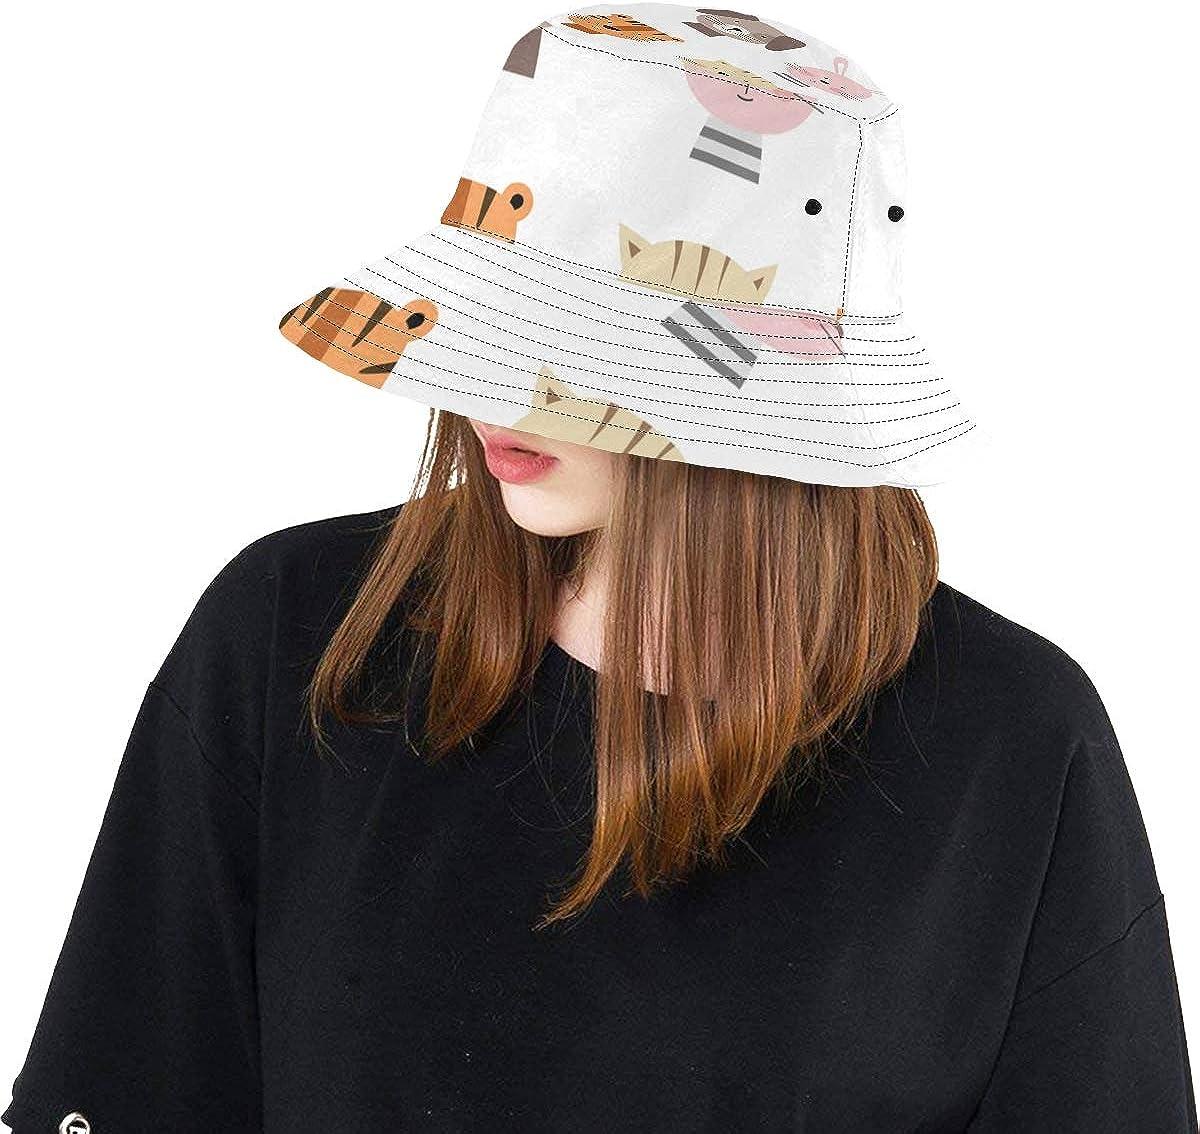 Cat Cute Lovely Pet Cartoon Summer Unisex Fishing Sun Top Bucket Hats for Kid Teens Women and Men with Packable Fisherman Cap for Outdoor Baseball Sport Picnic